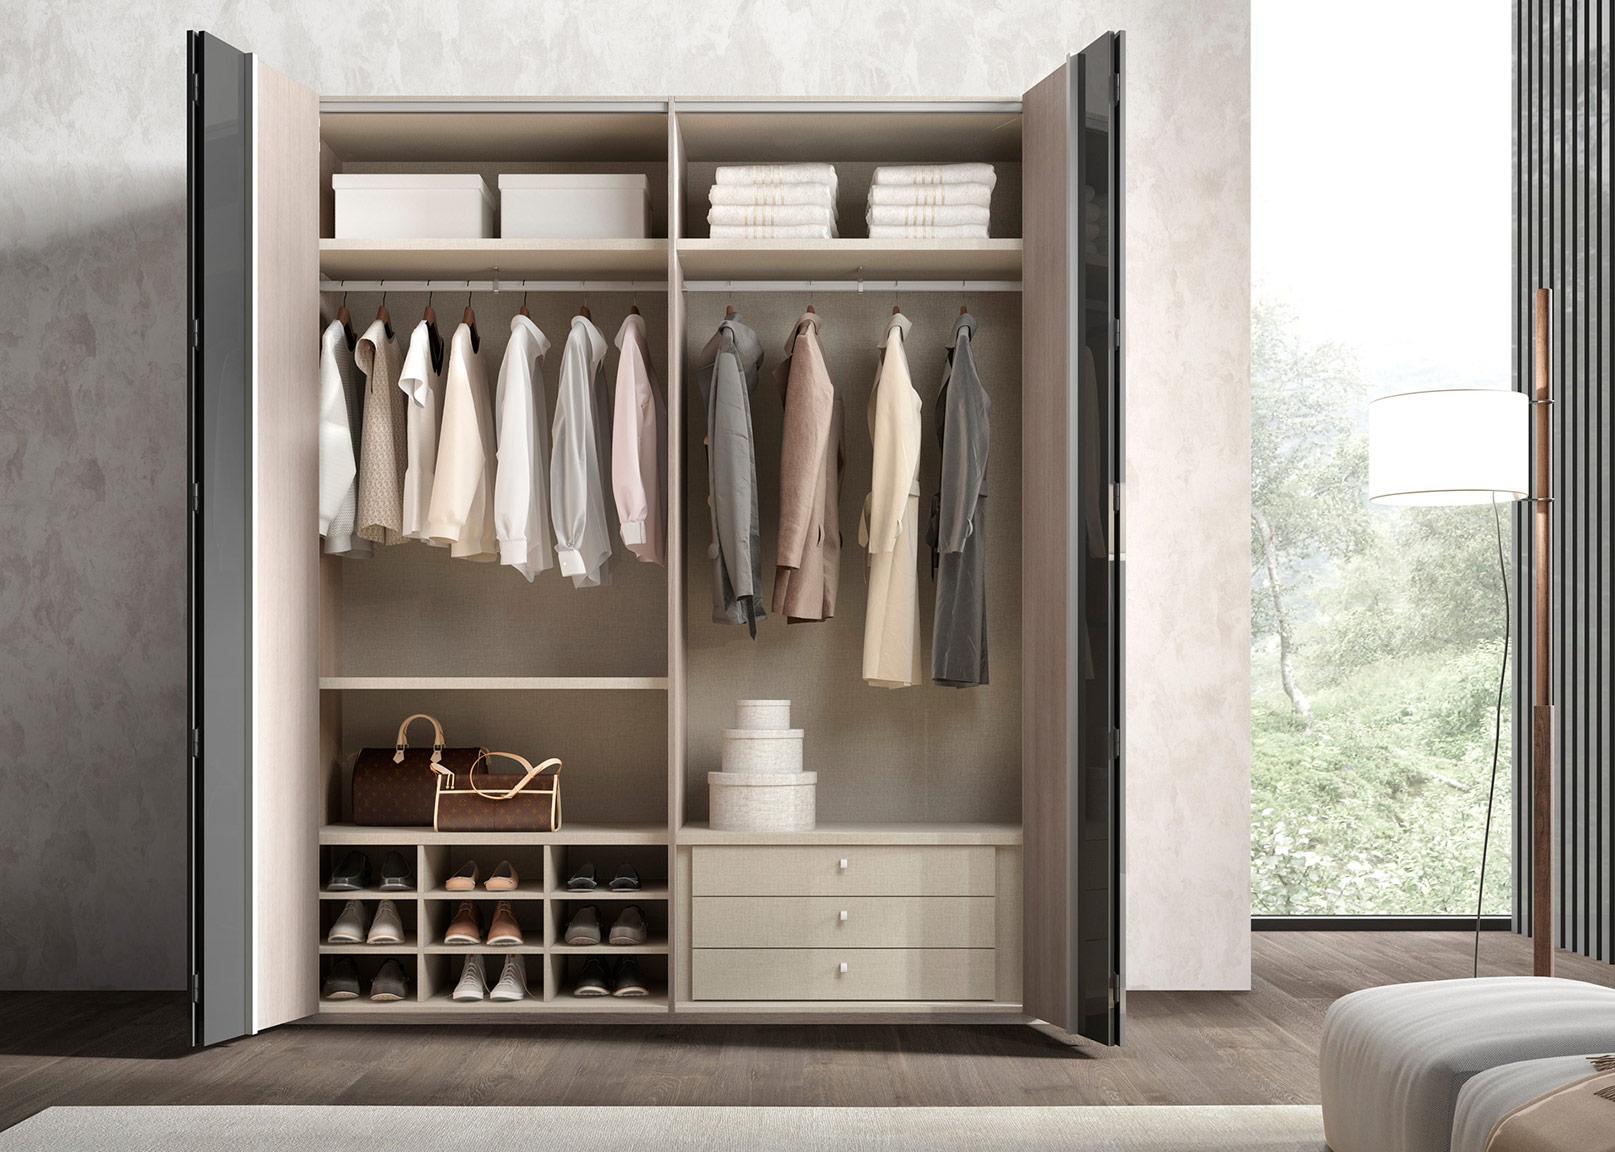 Pasos para disear un closet ideal para tu espacio  VISO